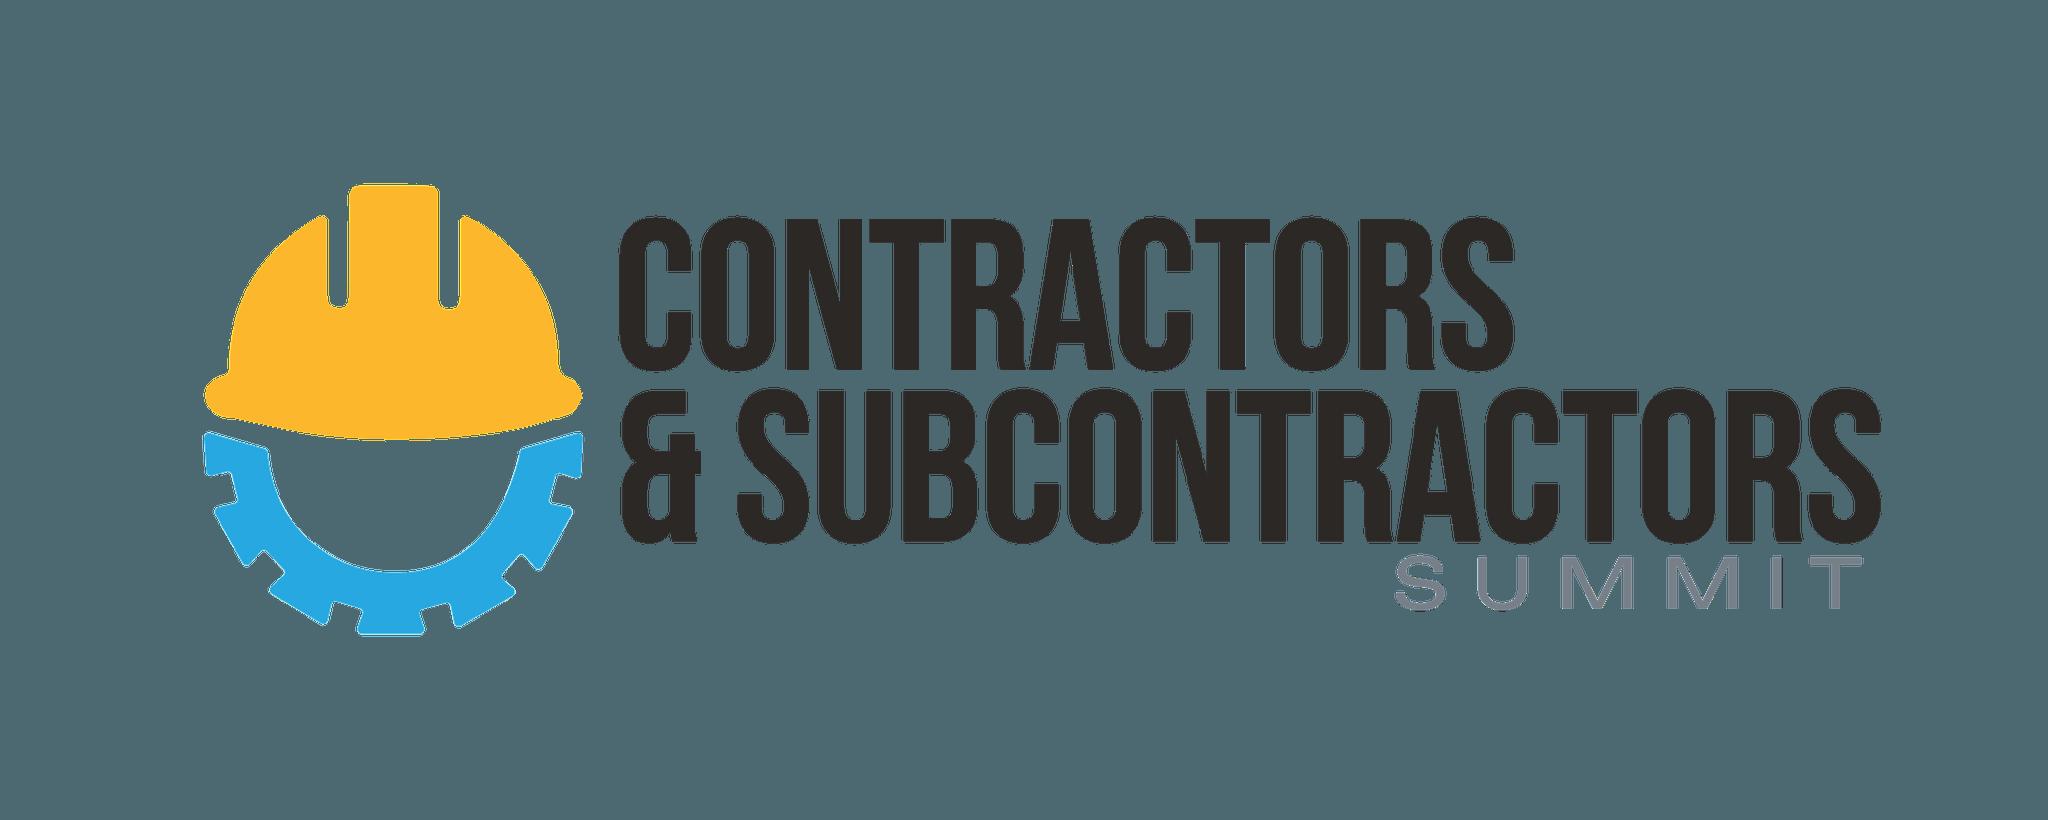 CONTRACTORS & SUBCONTRACTORS SUMMIT